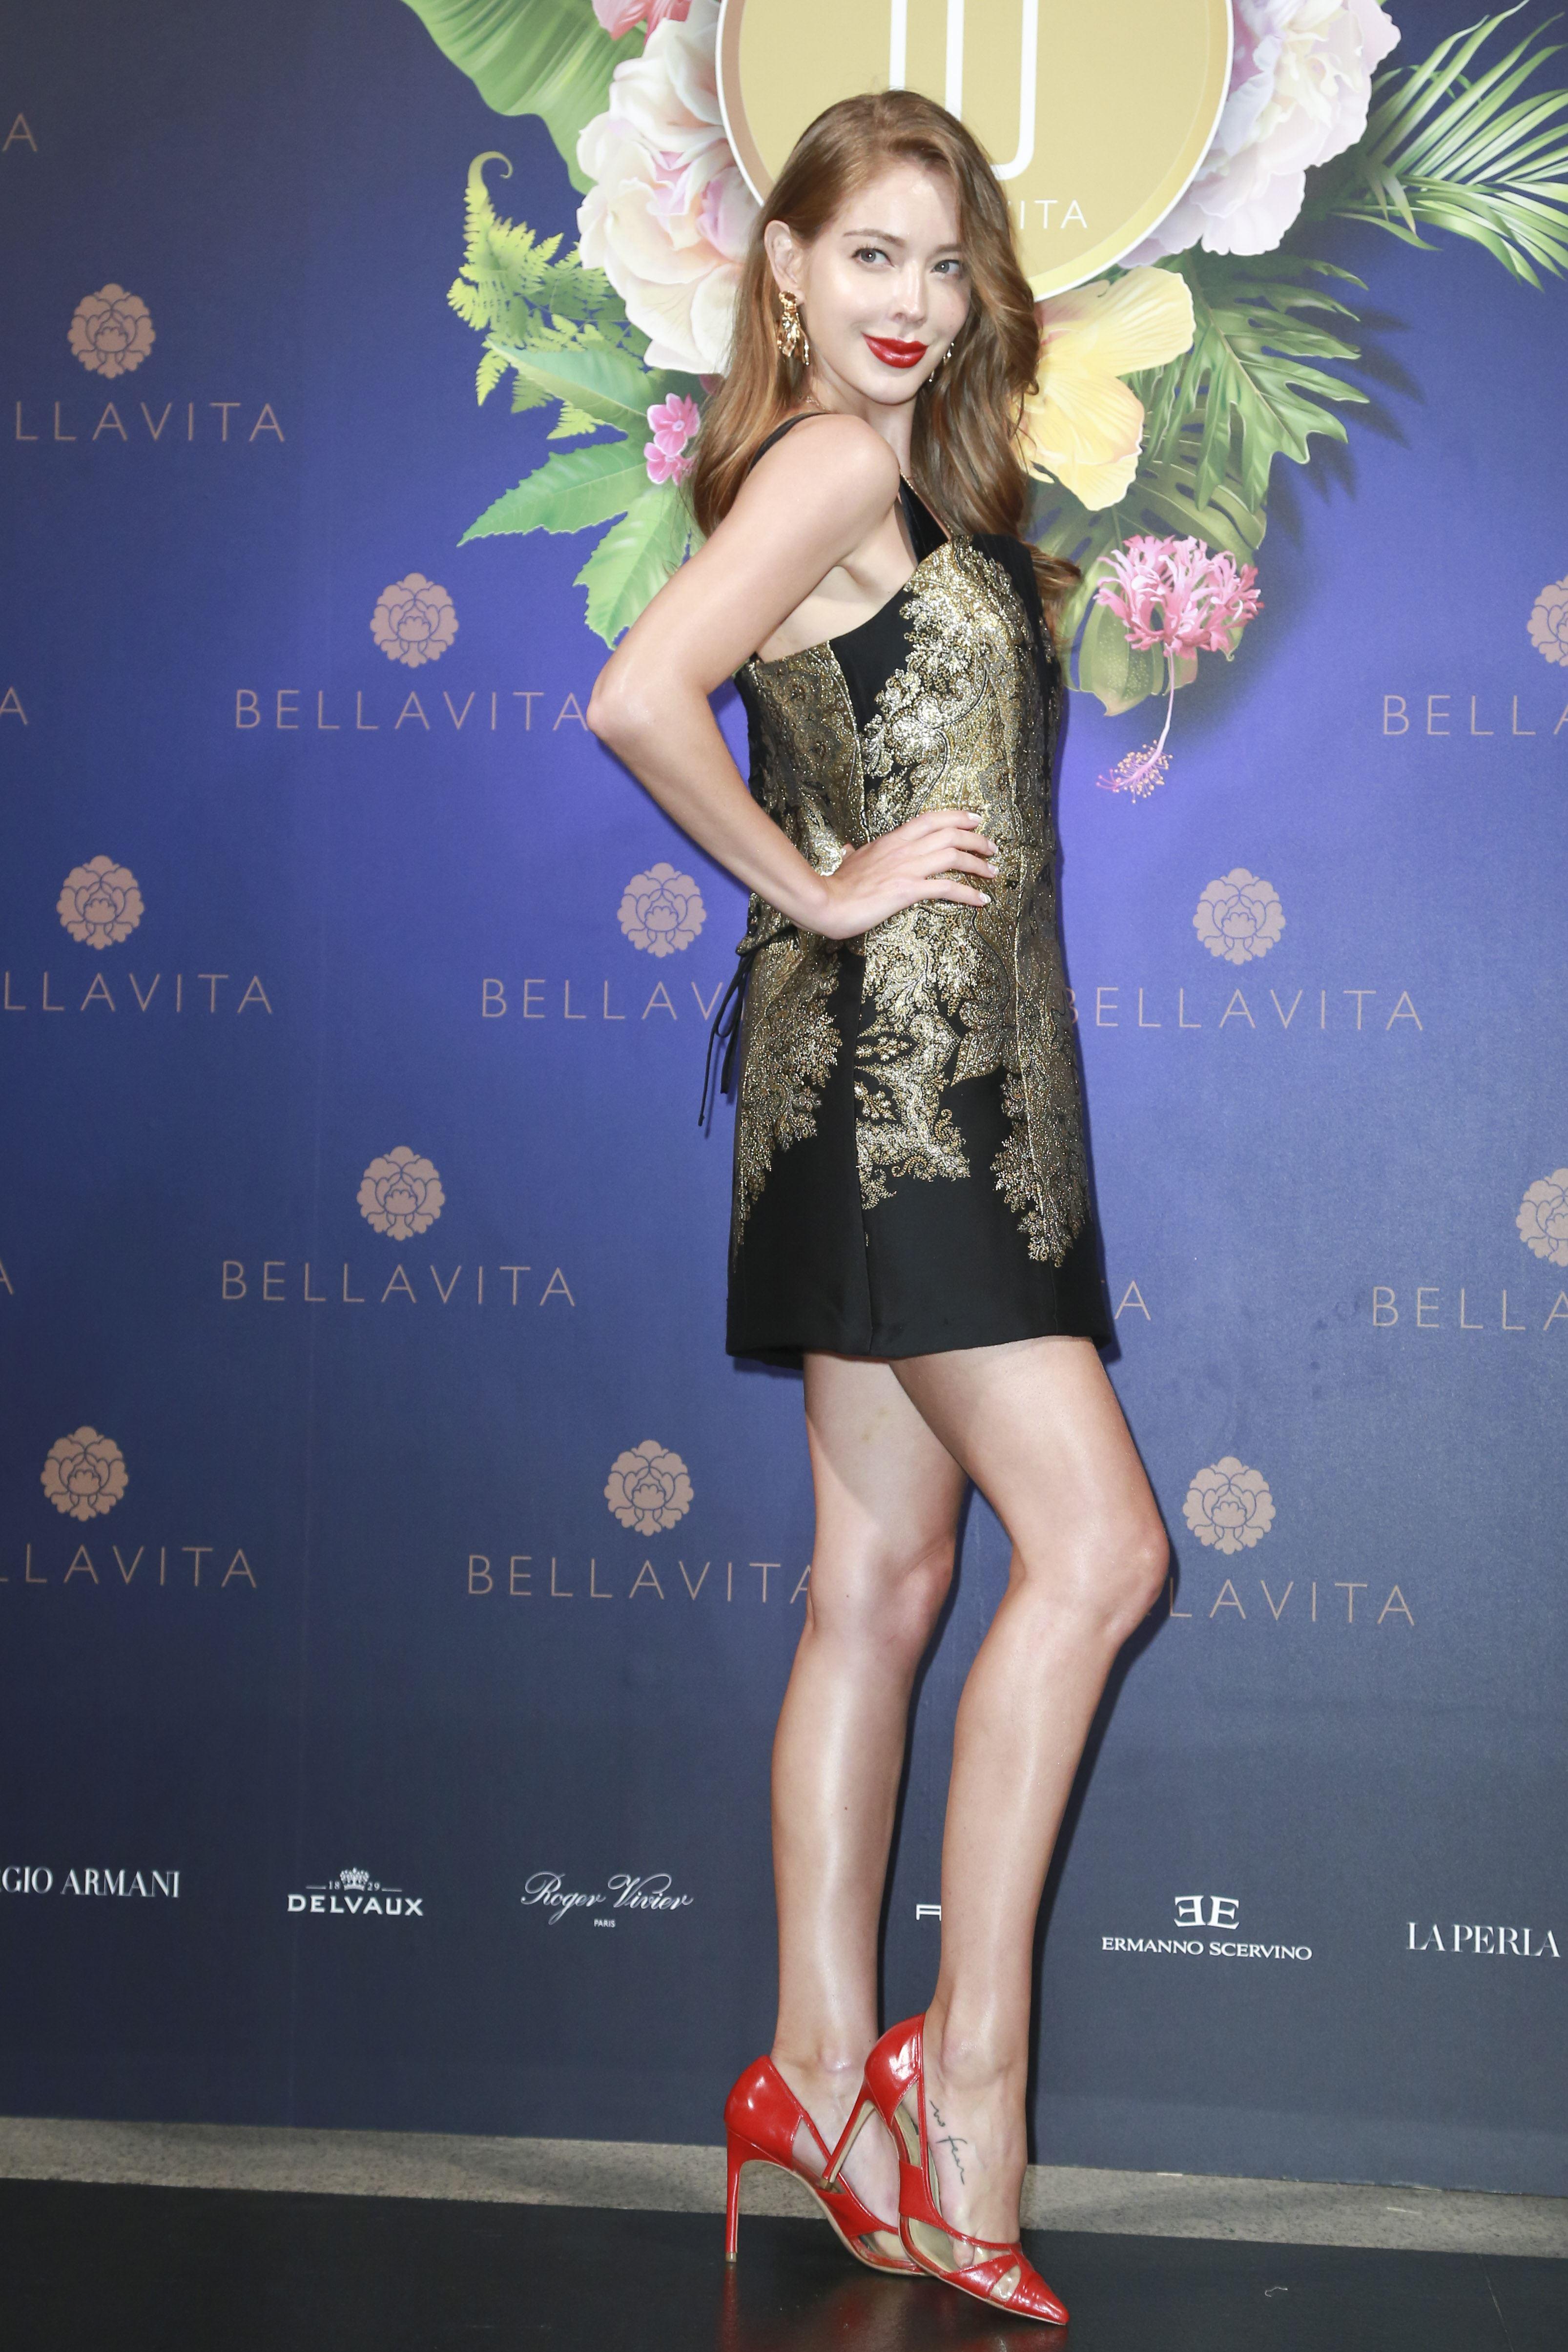 BELLAVITA歡慶10周年時尚之夜,安妮。(圖/記者林士傑攝影)